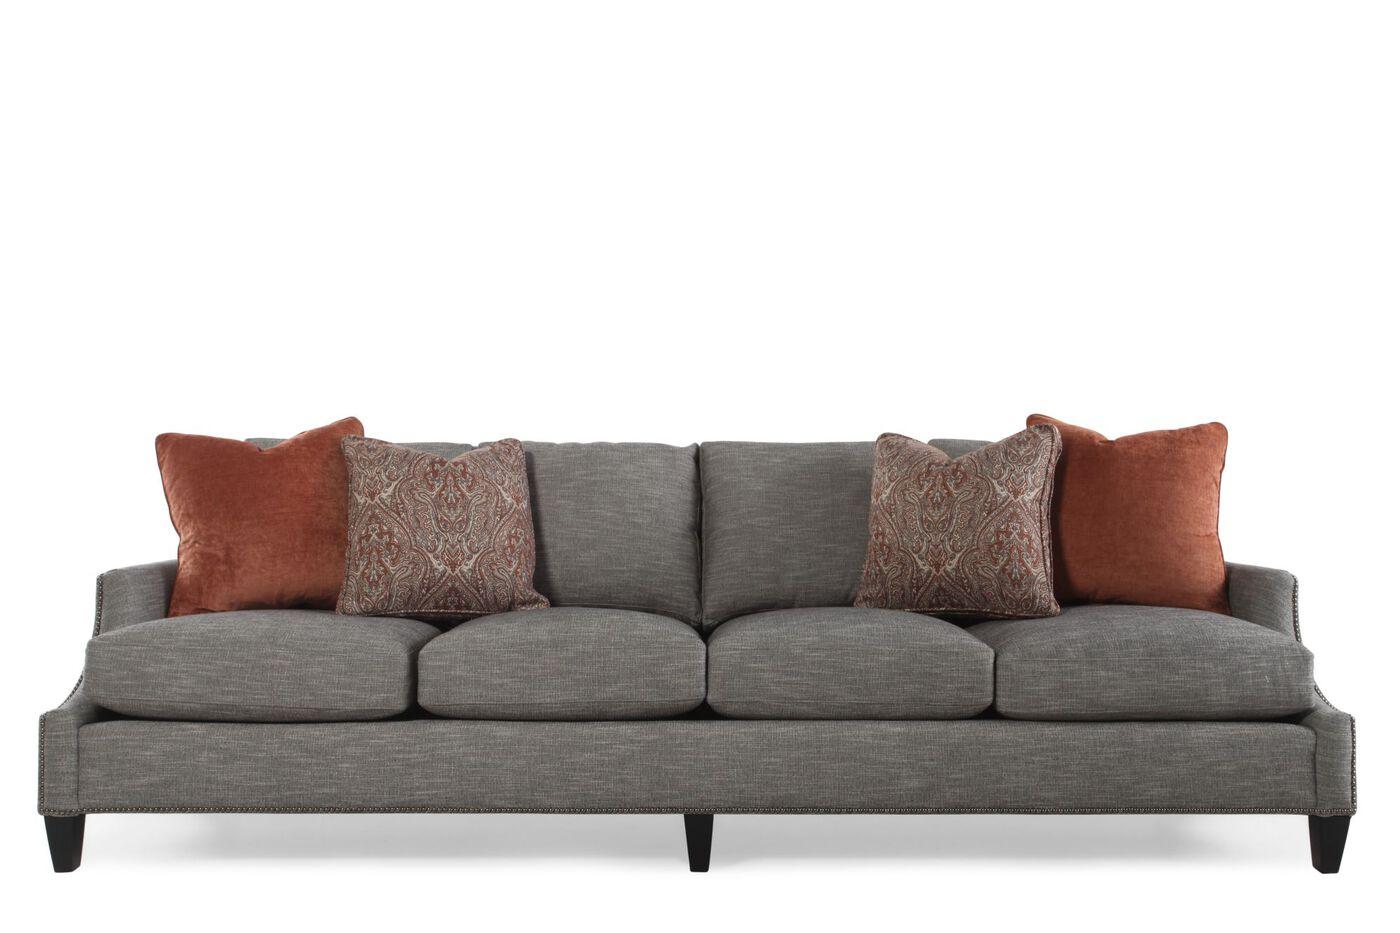 "Bernhardt Four Cushion 108 5"" Sofa in Pearl Gray"